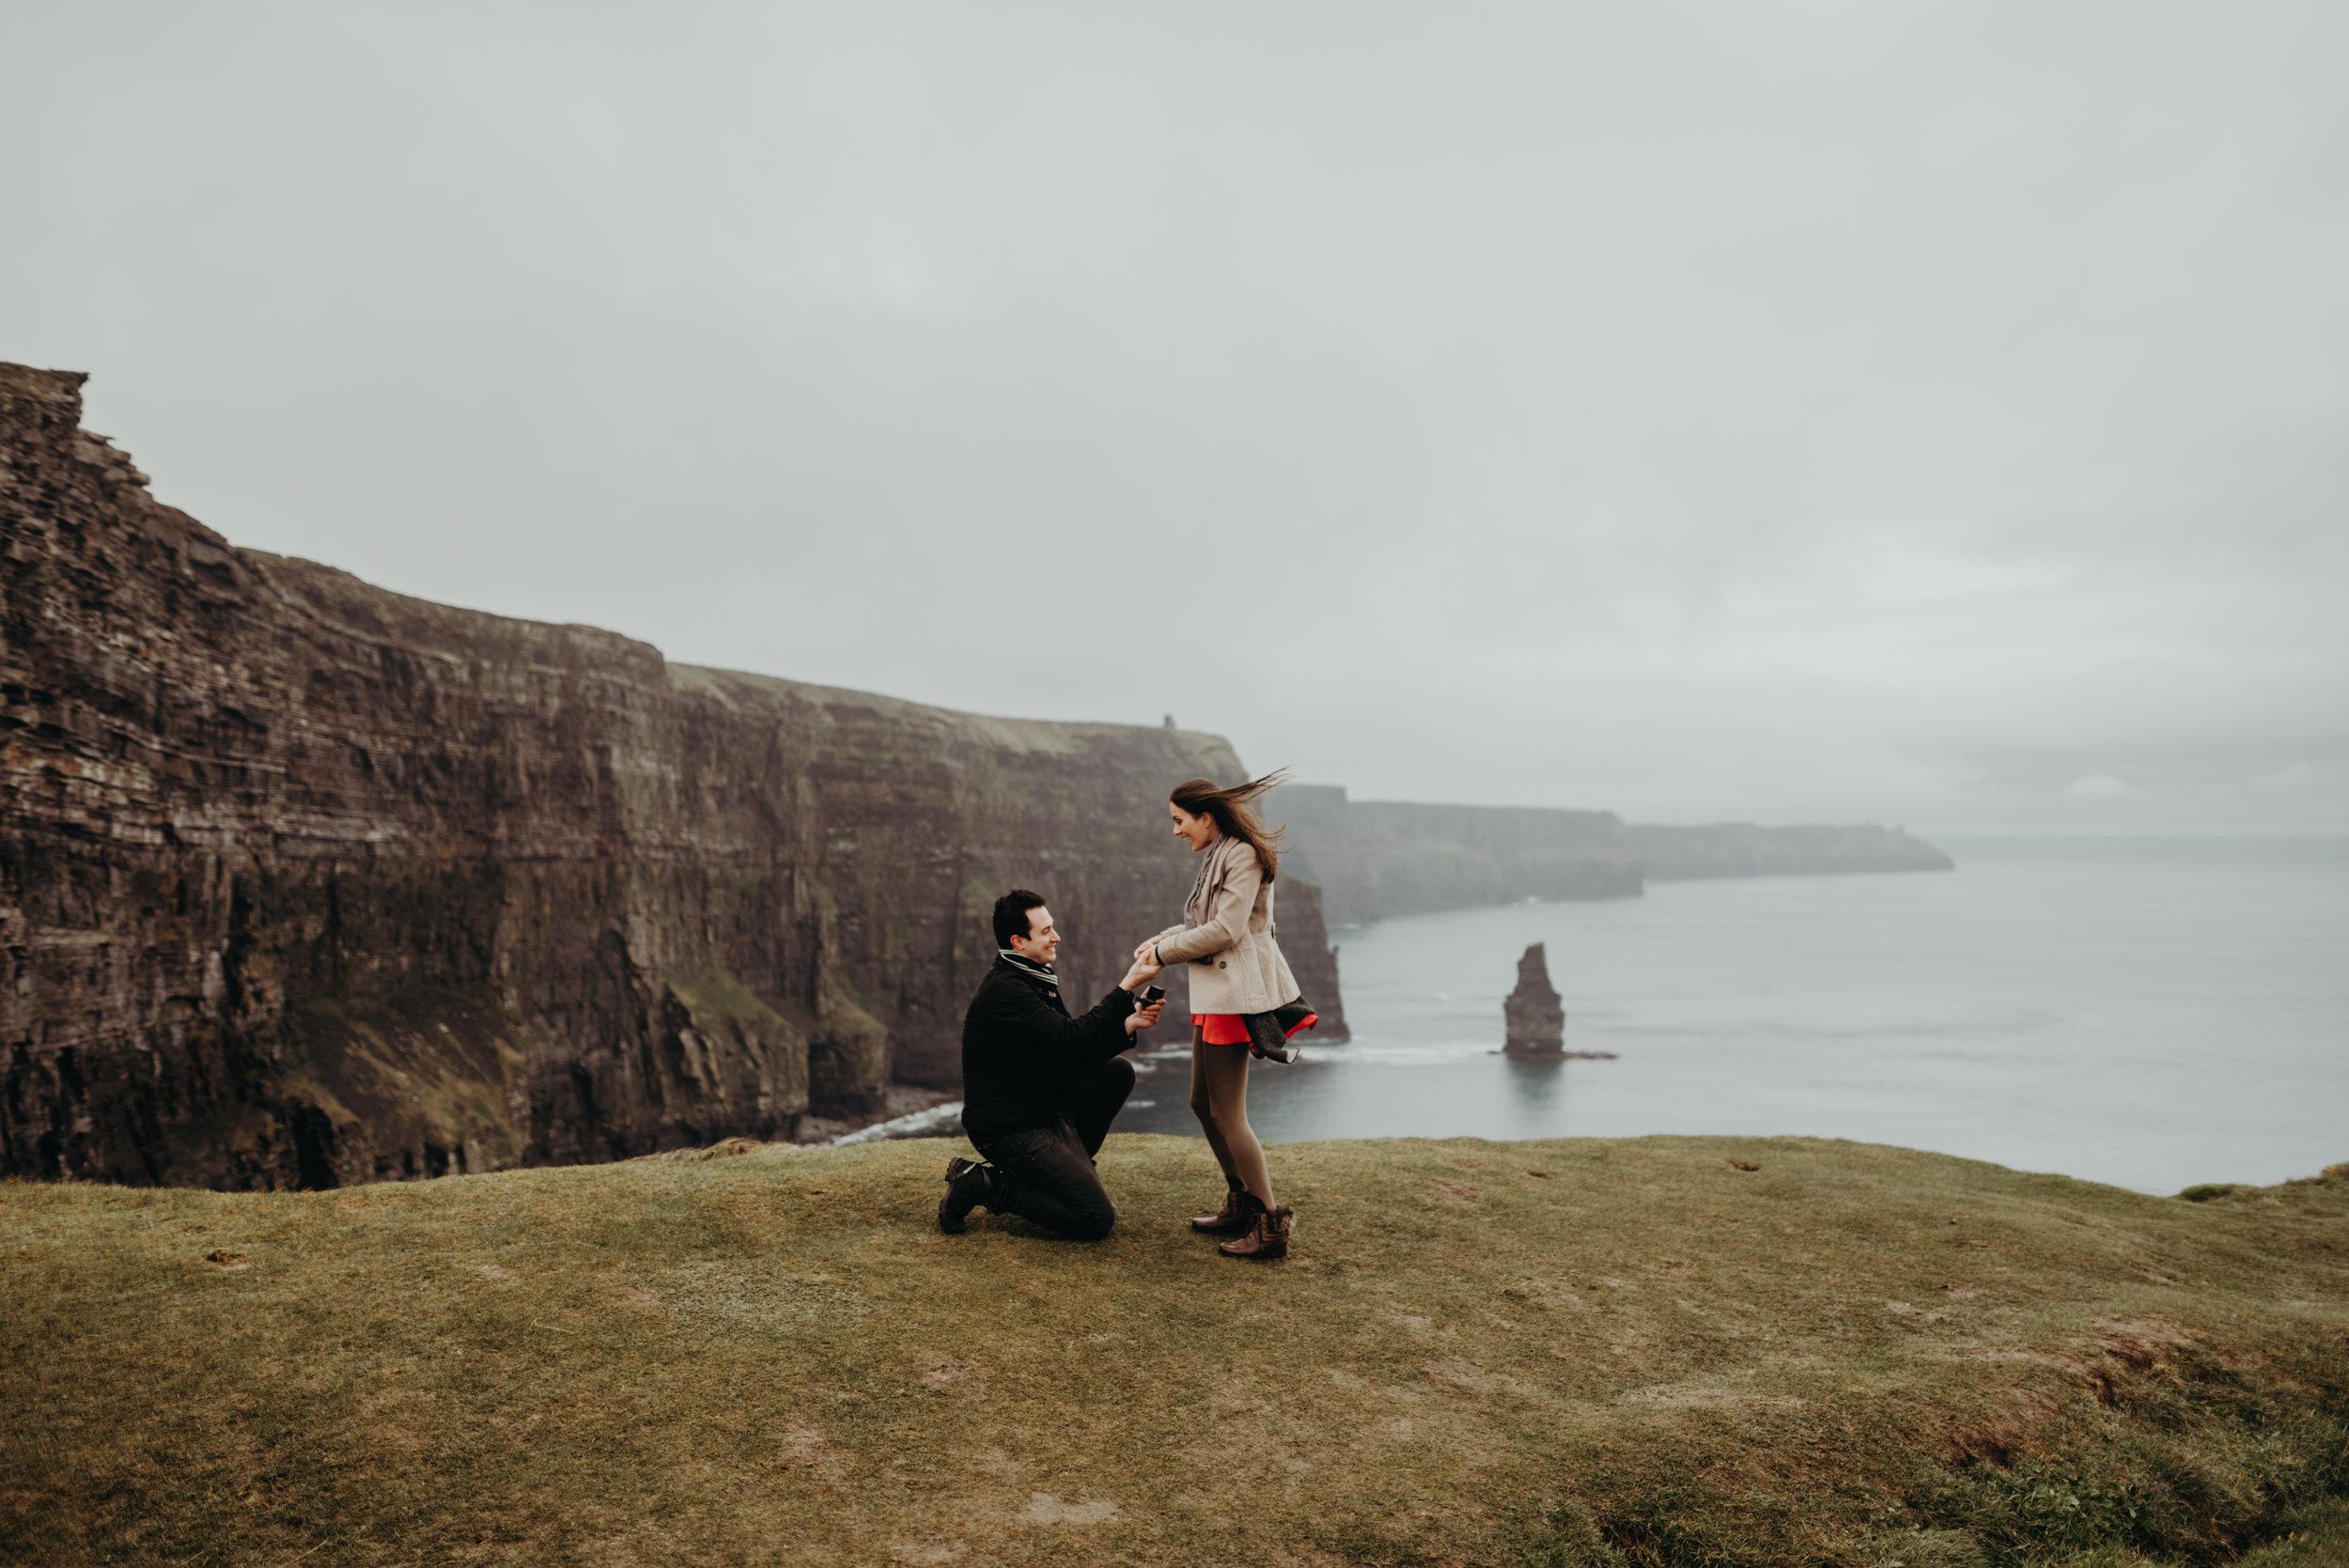 Cliffs Of Moher Engagement Session - Cliffs of Moher Proposal - Cliffs of Mhoer Elopement_5085-Edit-10.jpg